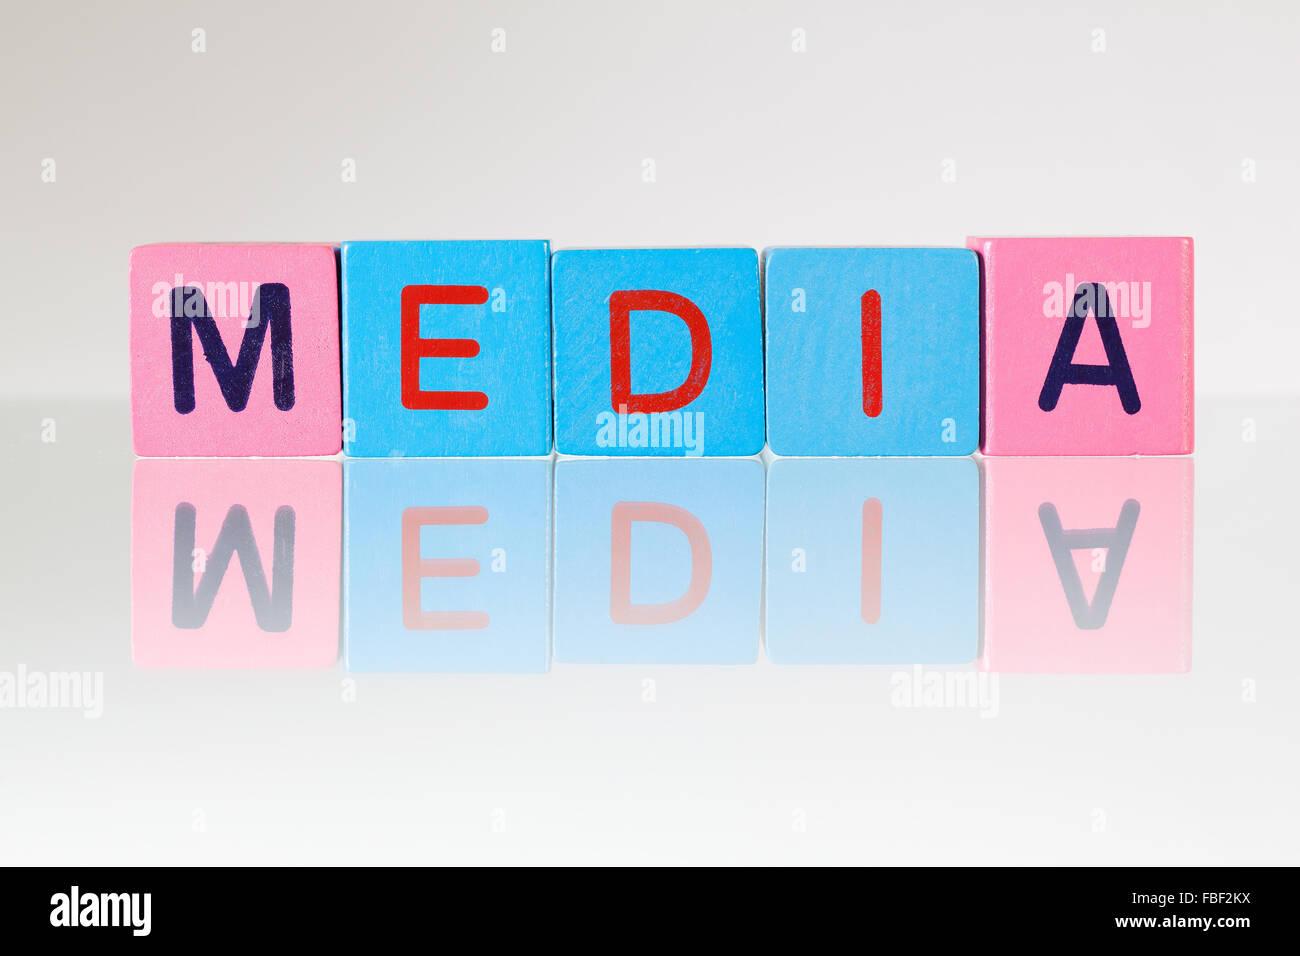 Media - an inscription from children's wooden blocks - Stock Image